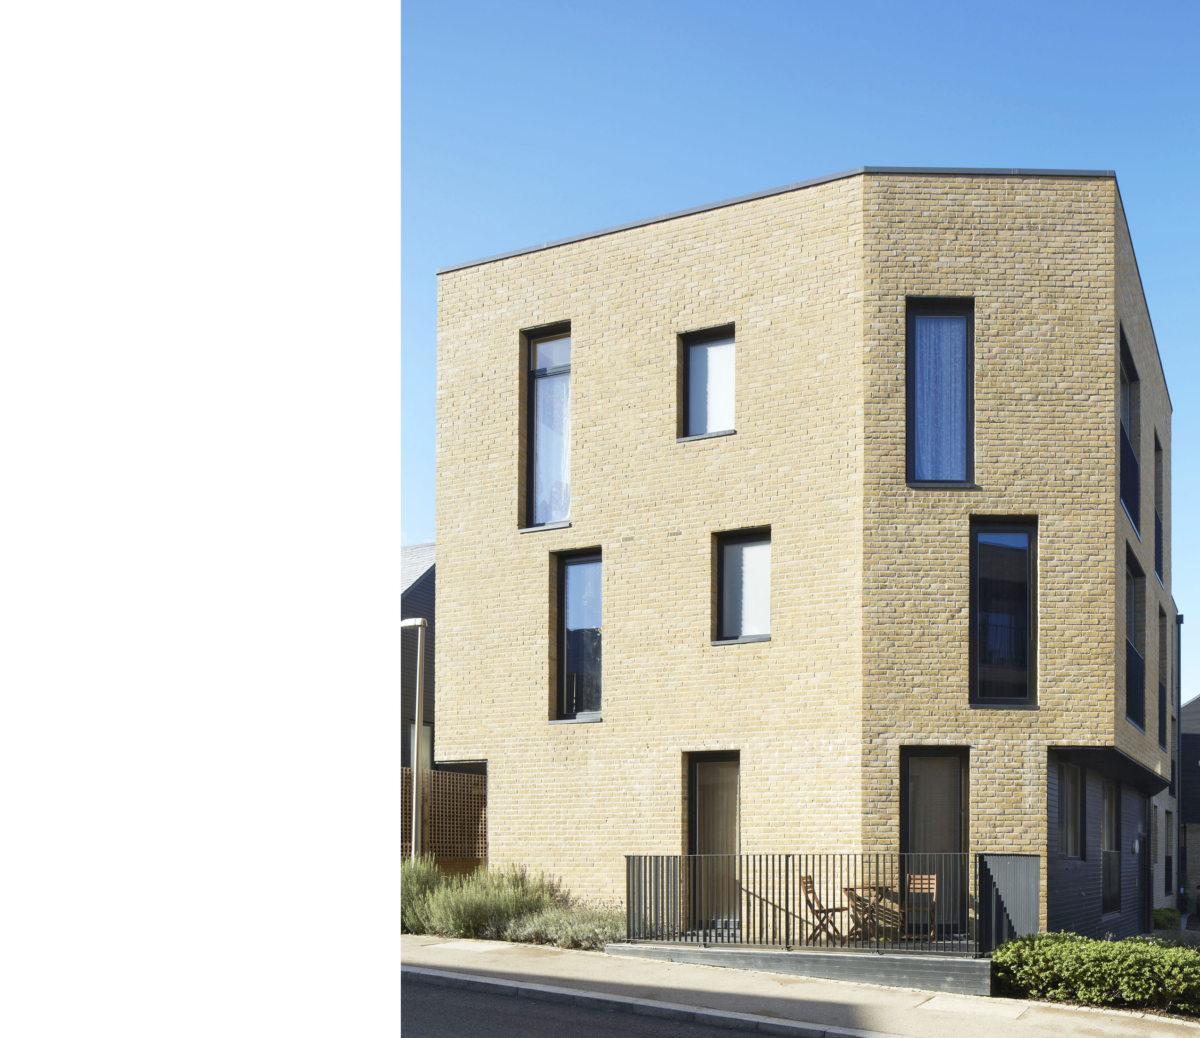 Essex Apartments: Alison Brooks Architects